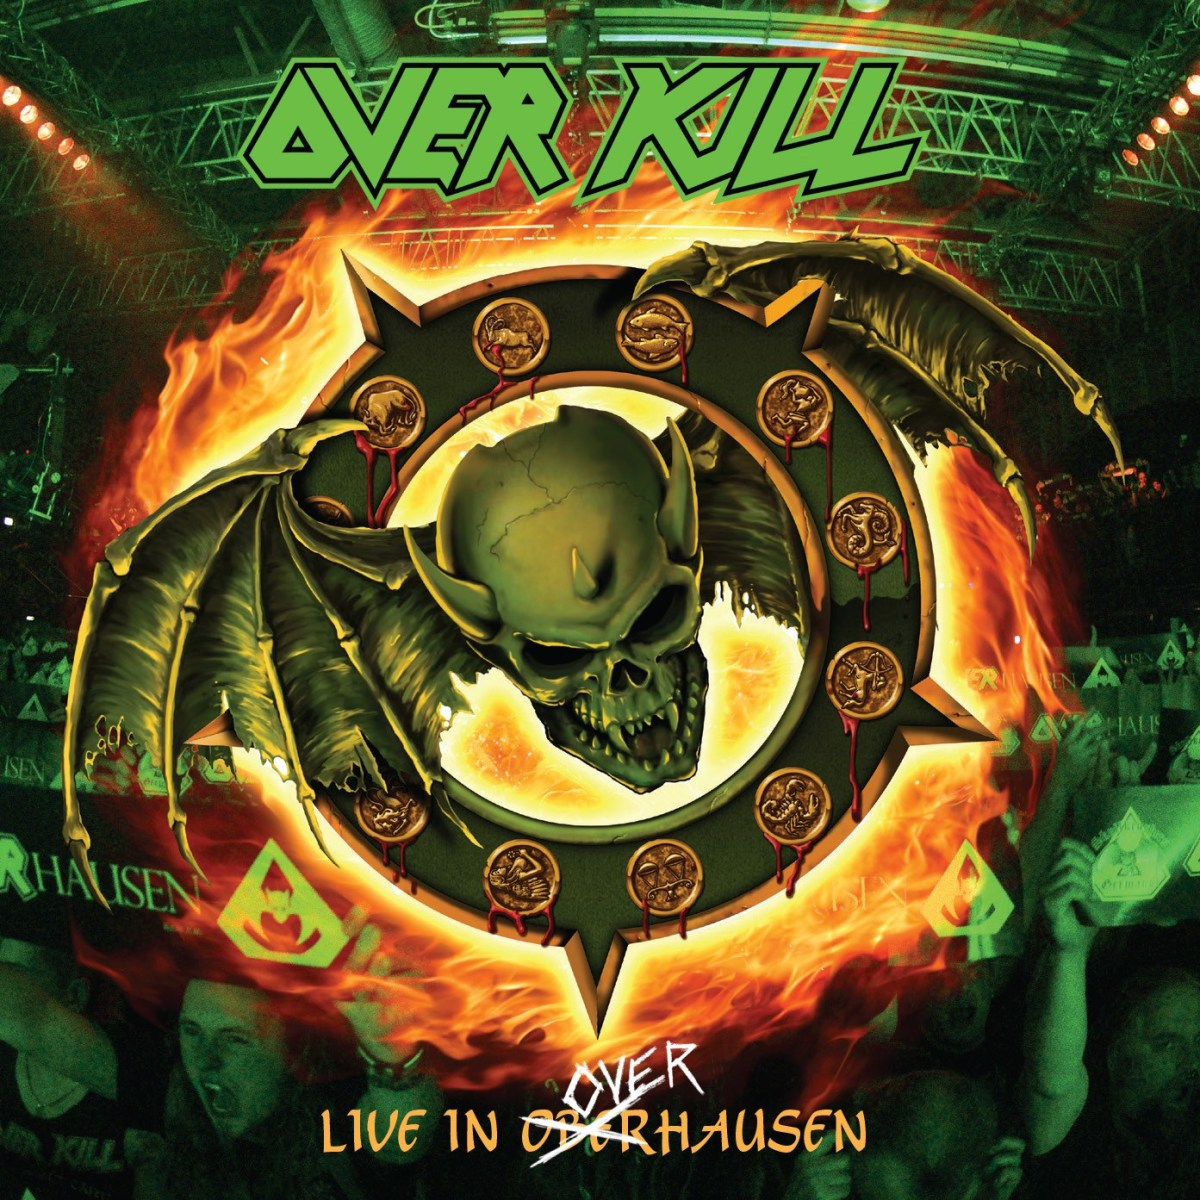 overkill-live-in-overhausen-cd-review